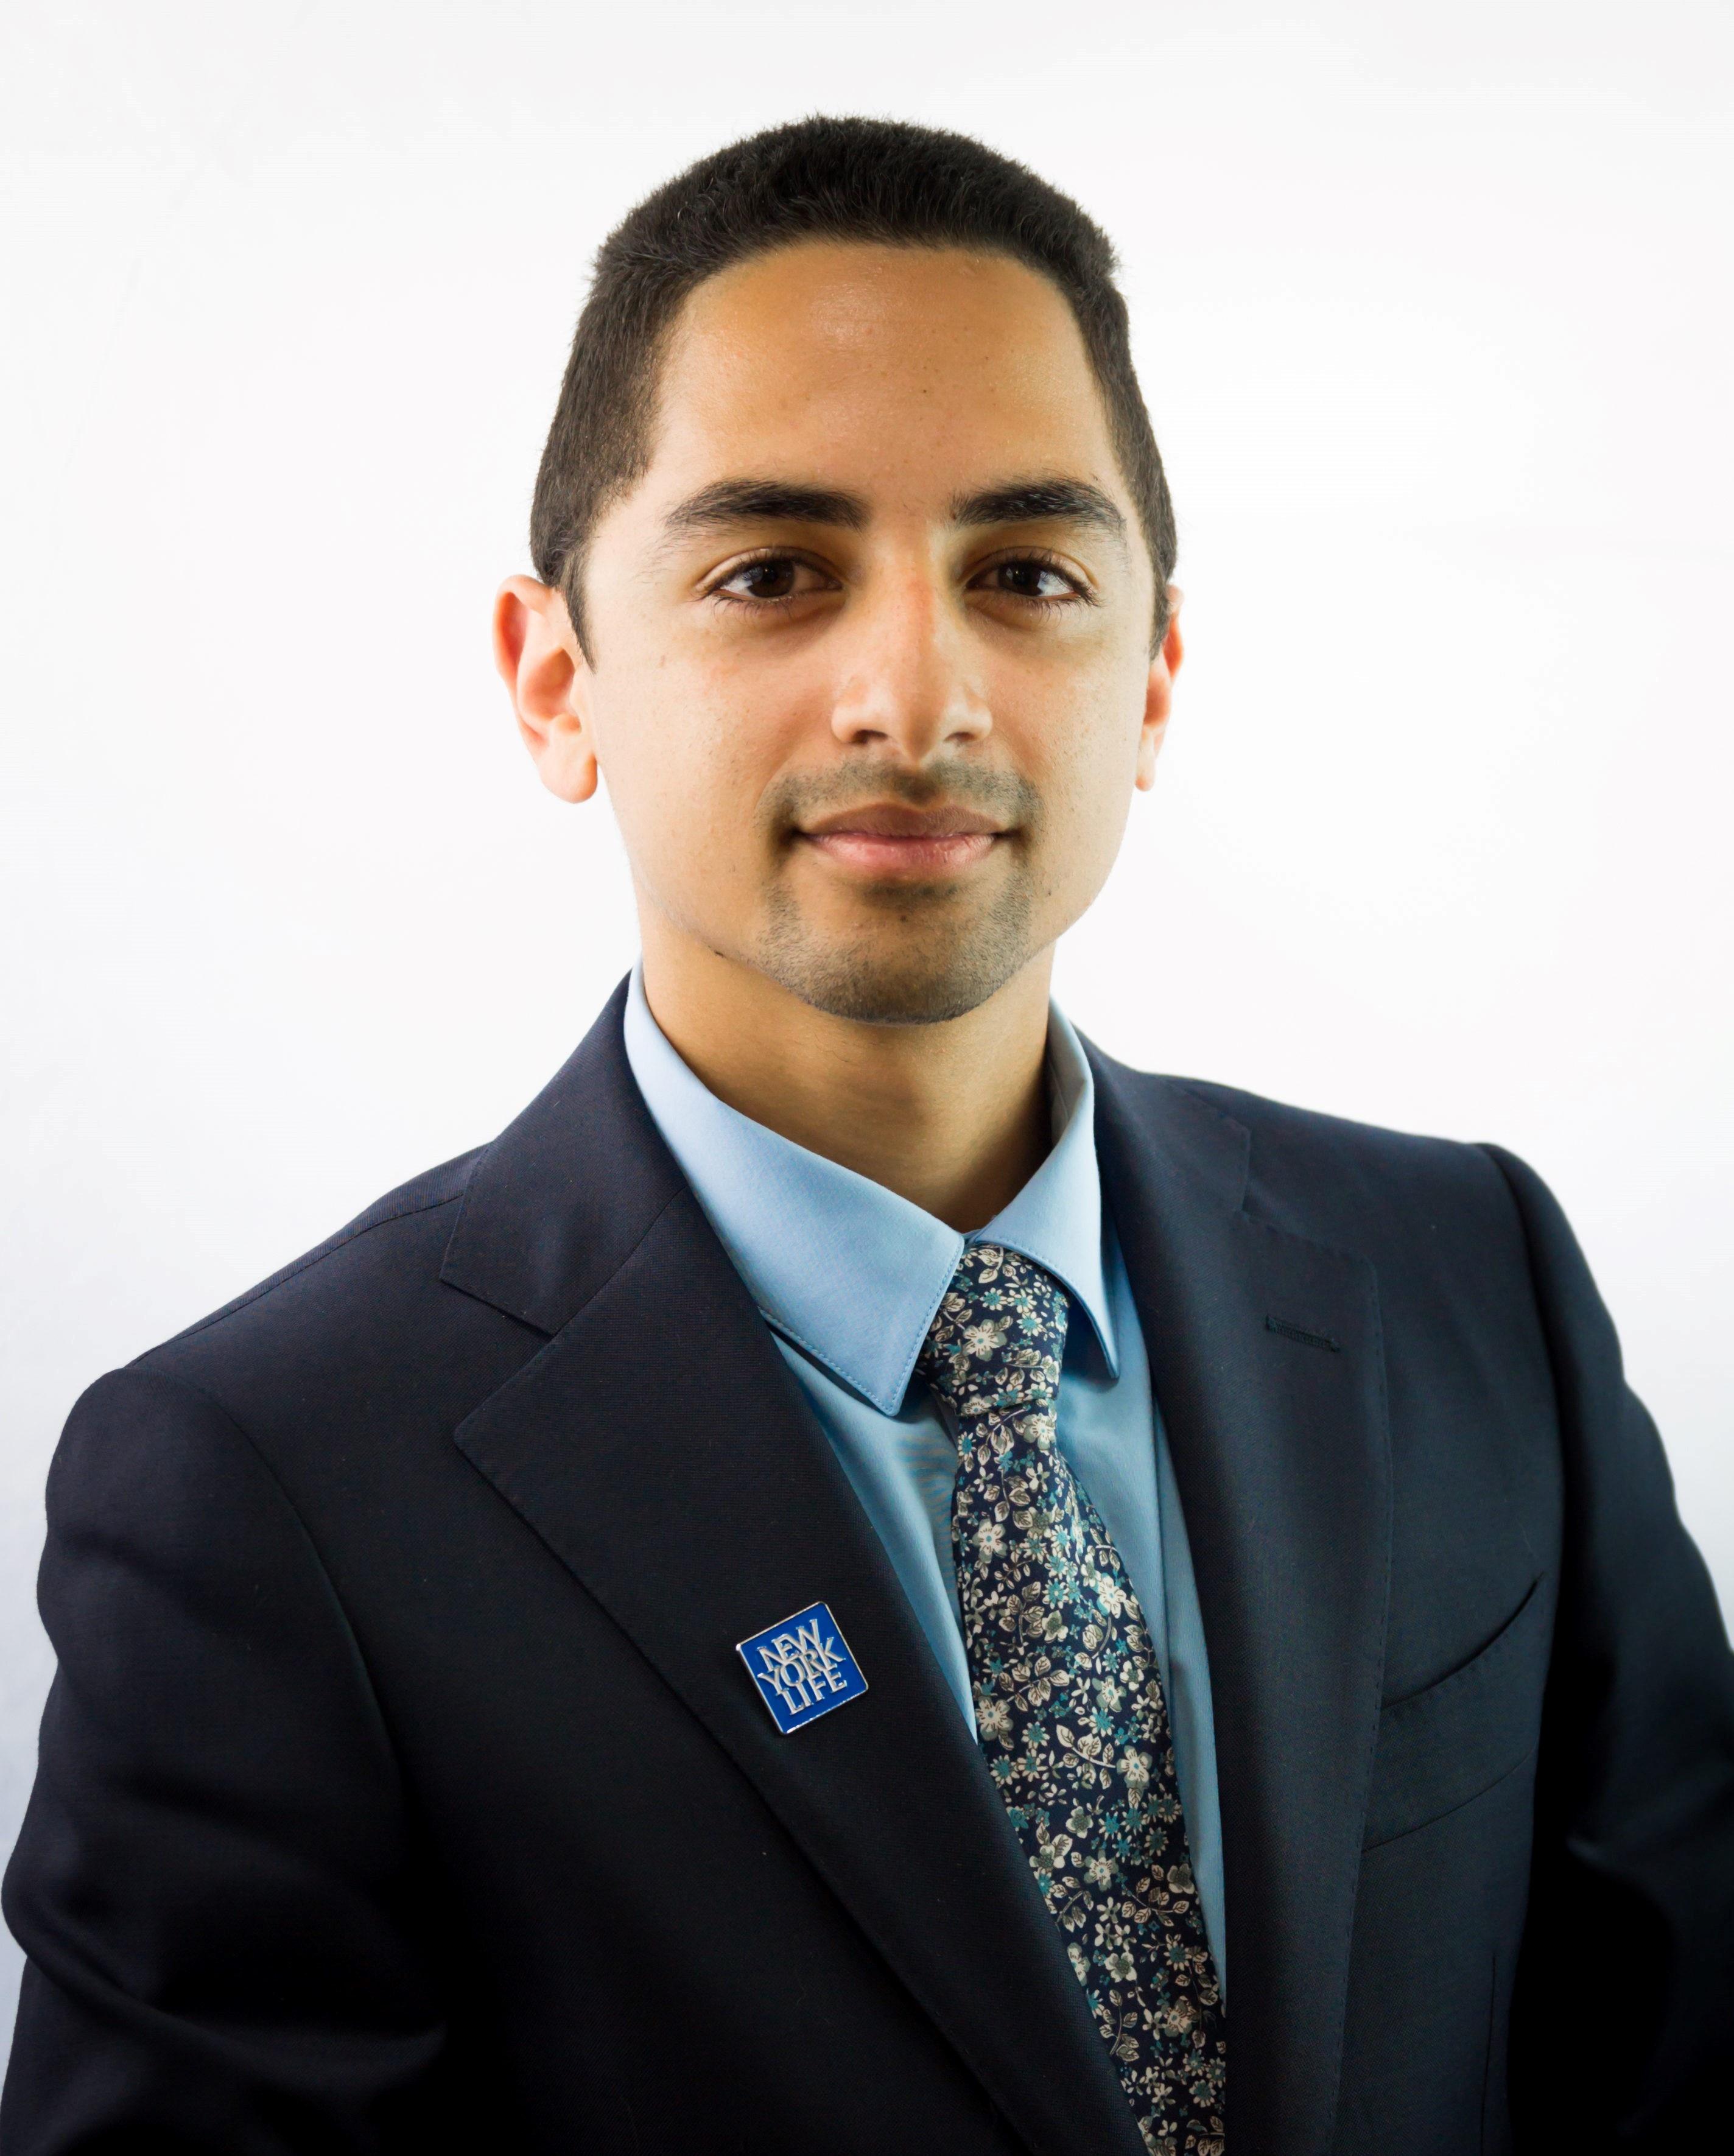 GREGORY JUNIOR HERRERA HERNANDEZ  Your Registered Representative & Insurance Agent